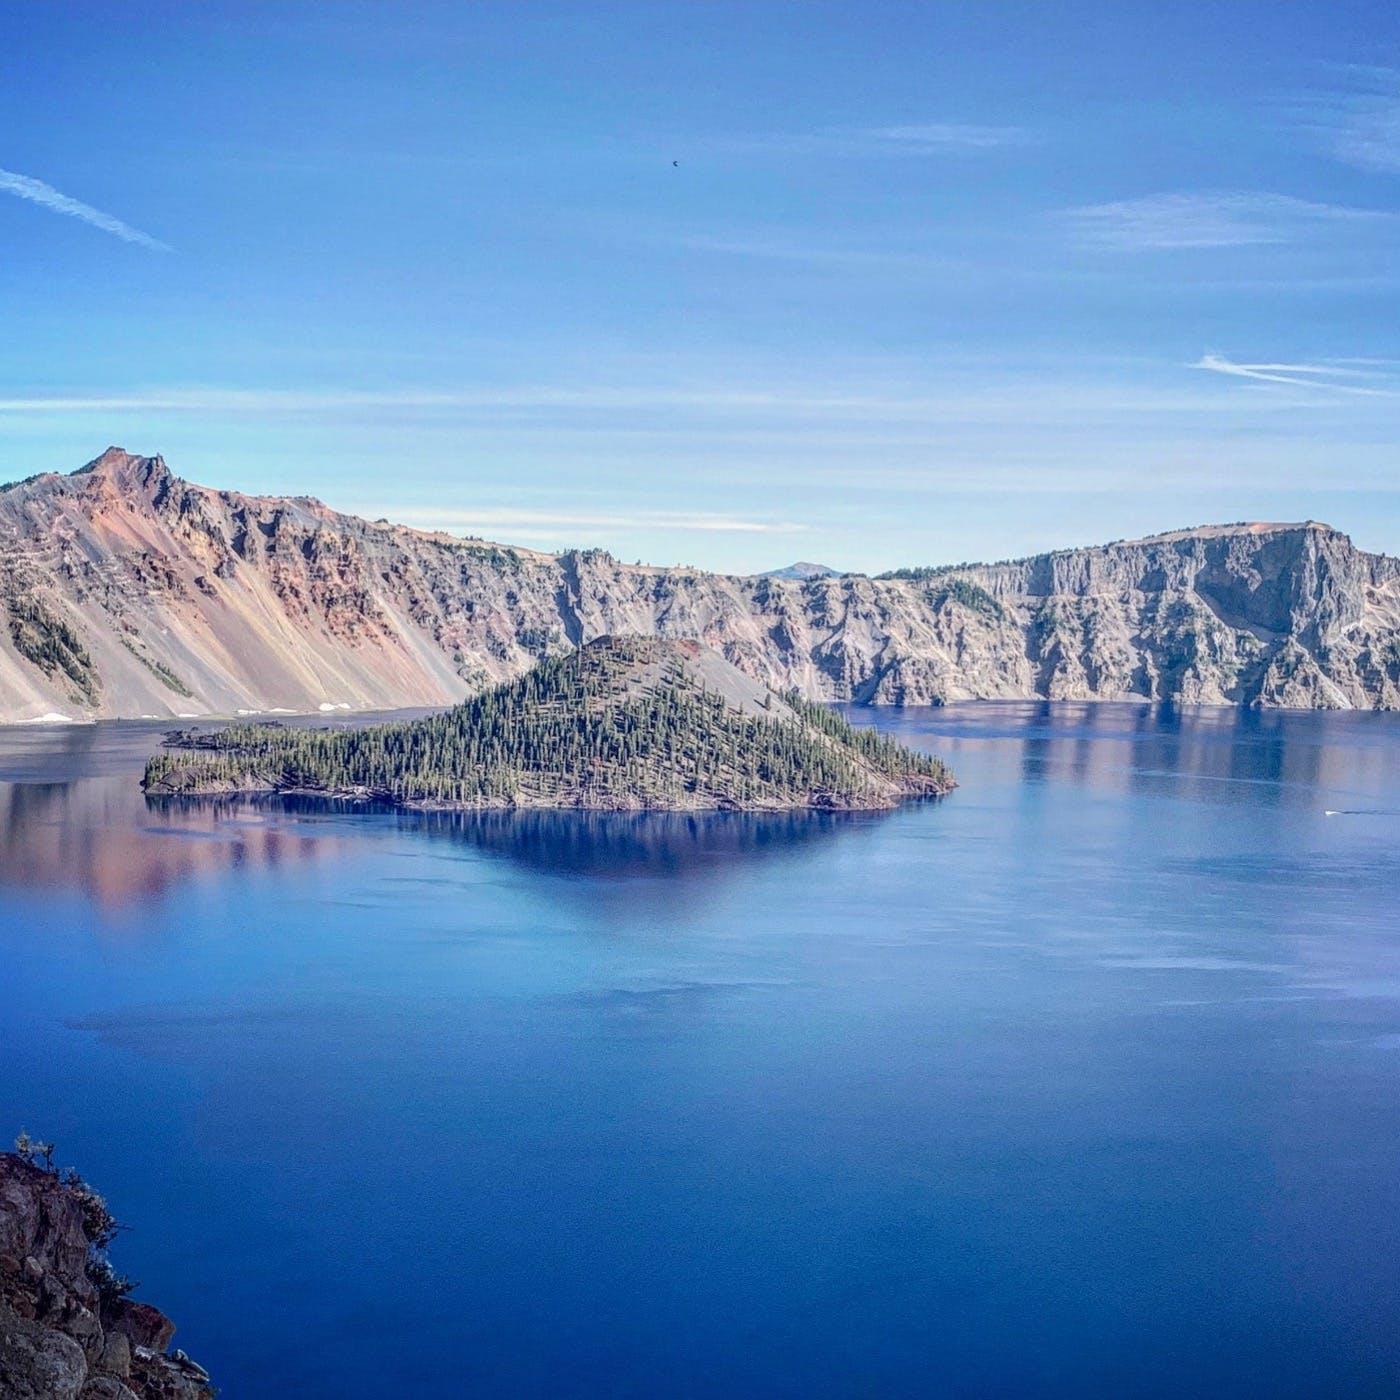 42 Crater Lake National Park